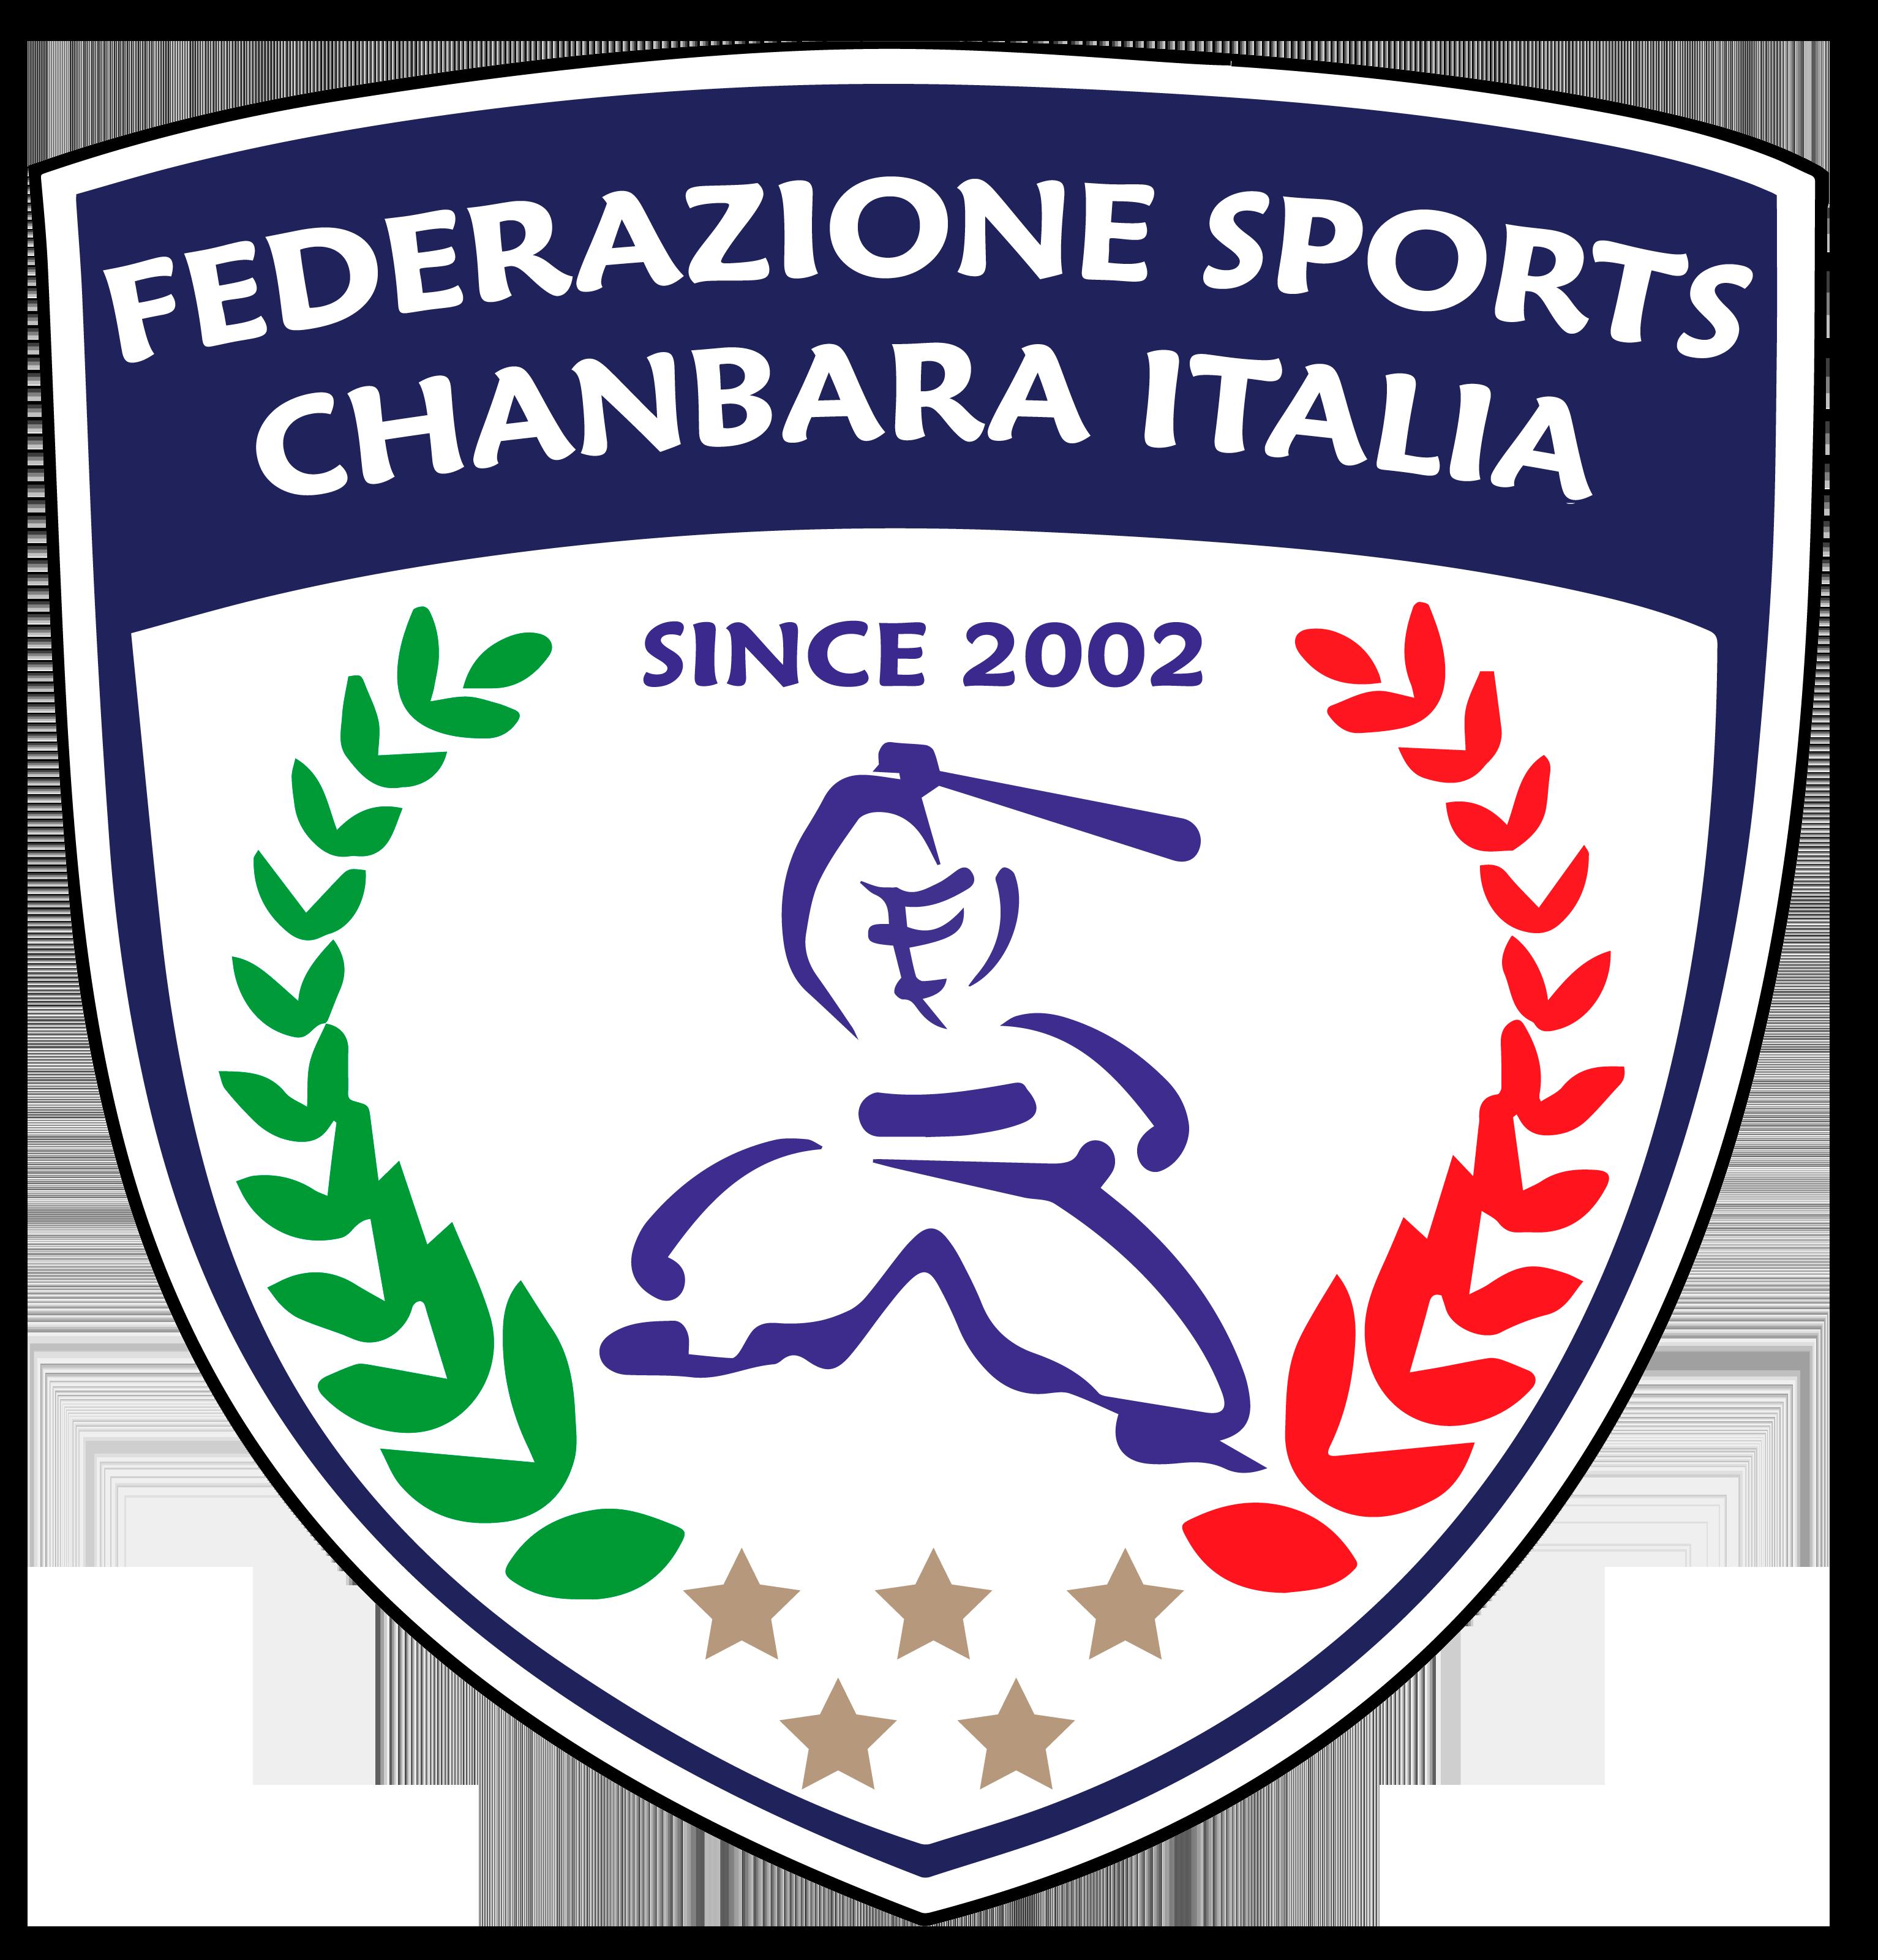 Federazione Sports Chanbara Italia